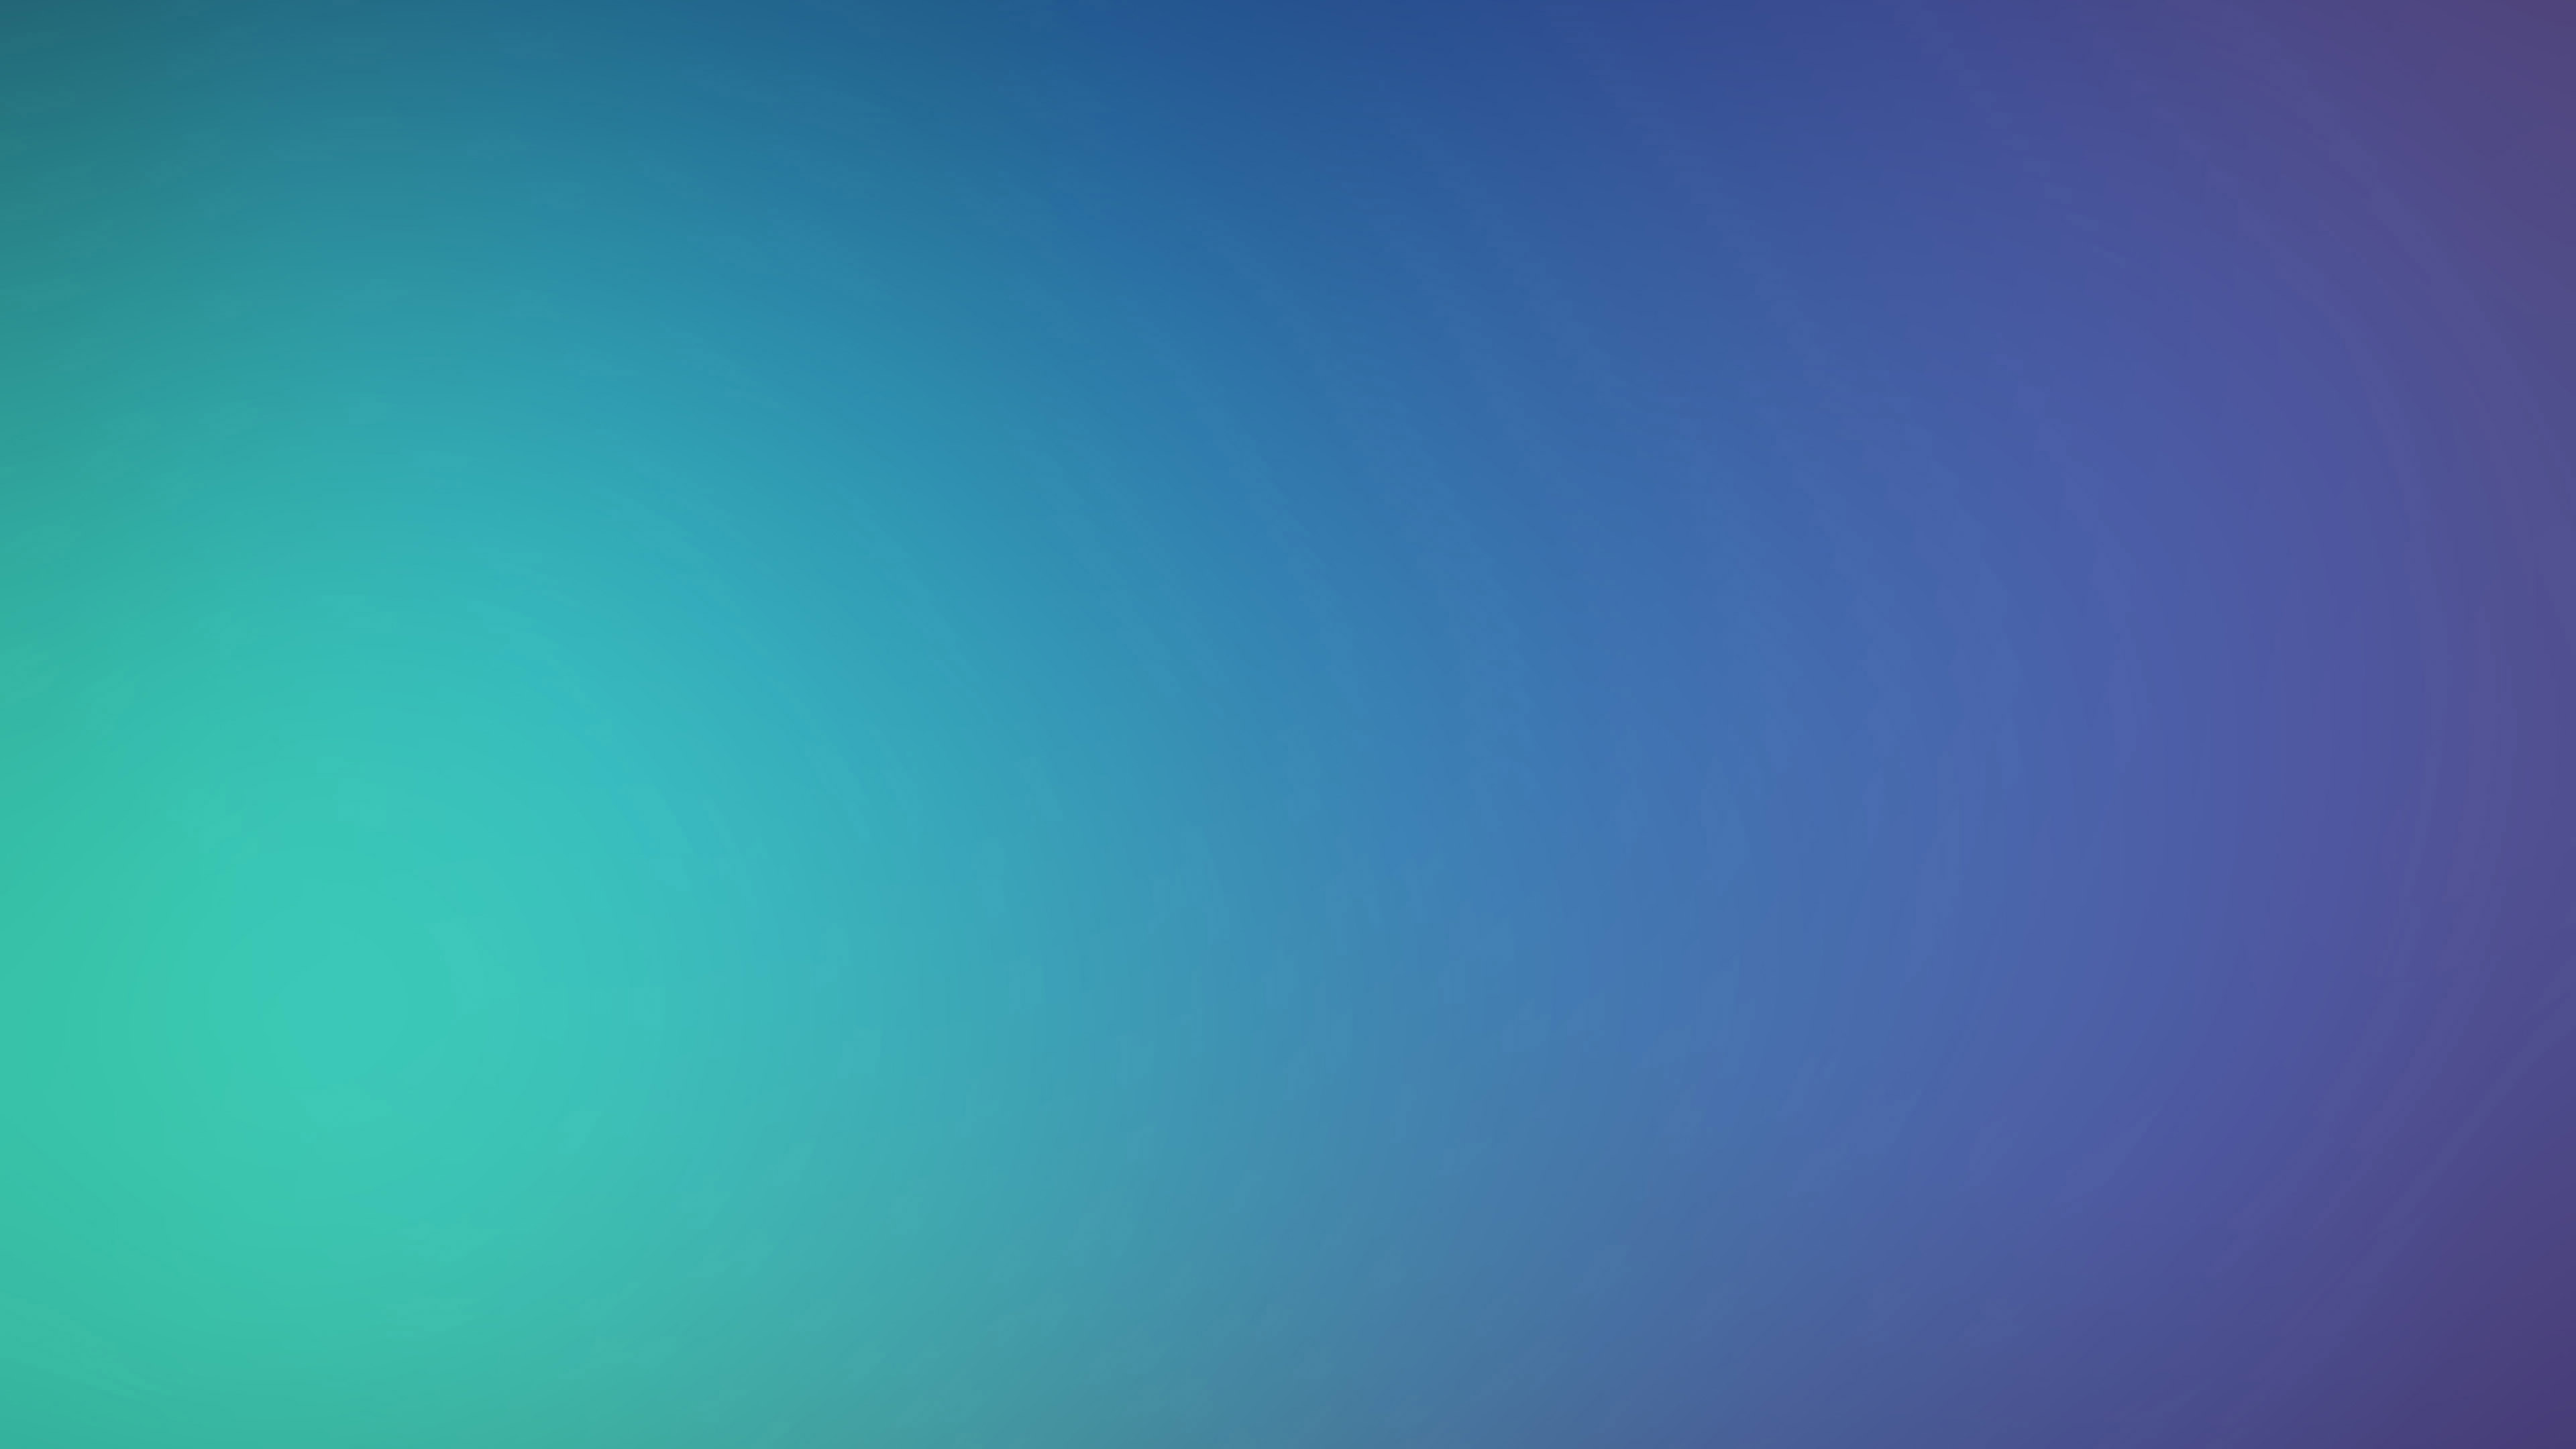 Minimalist Fall Wallpapers Sd69 Blue Windows Green Gradation Blur Papers Co